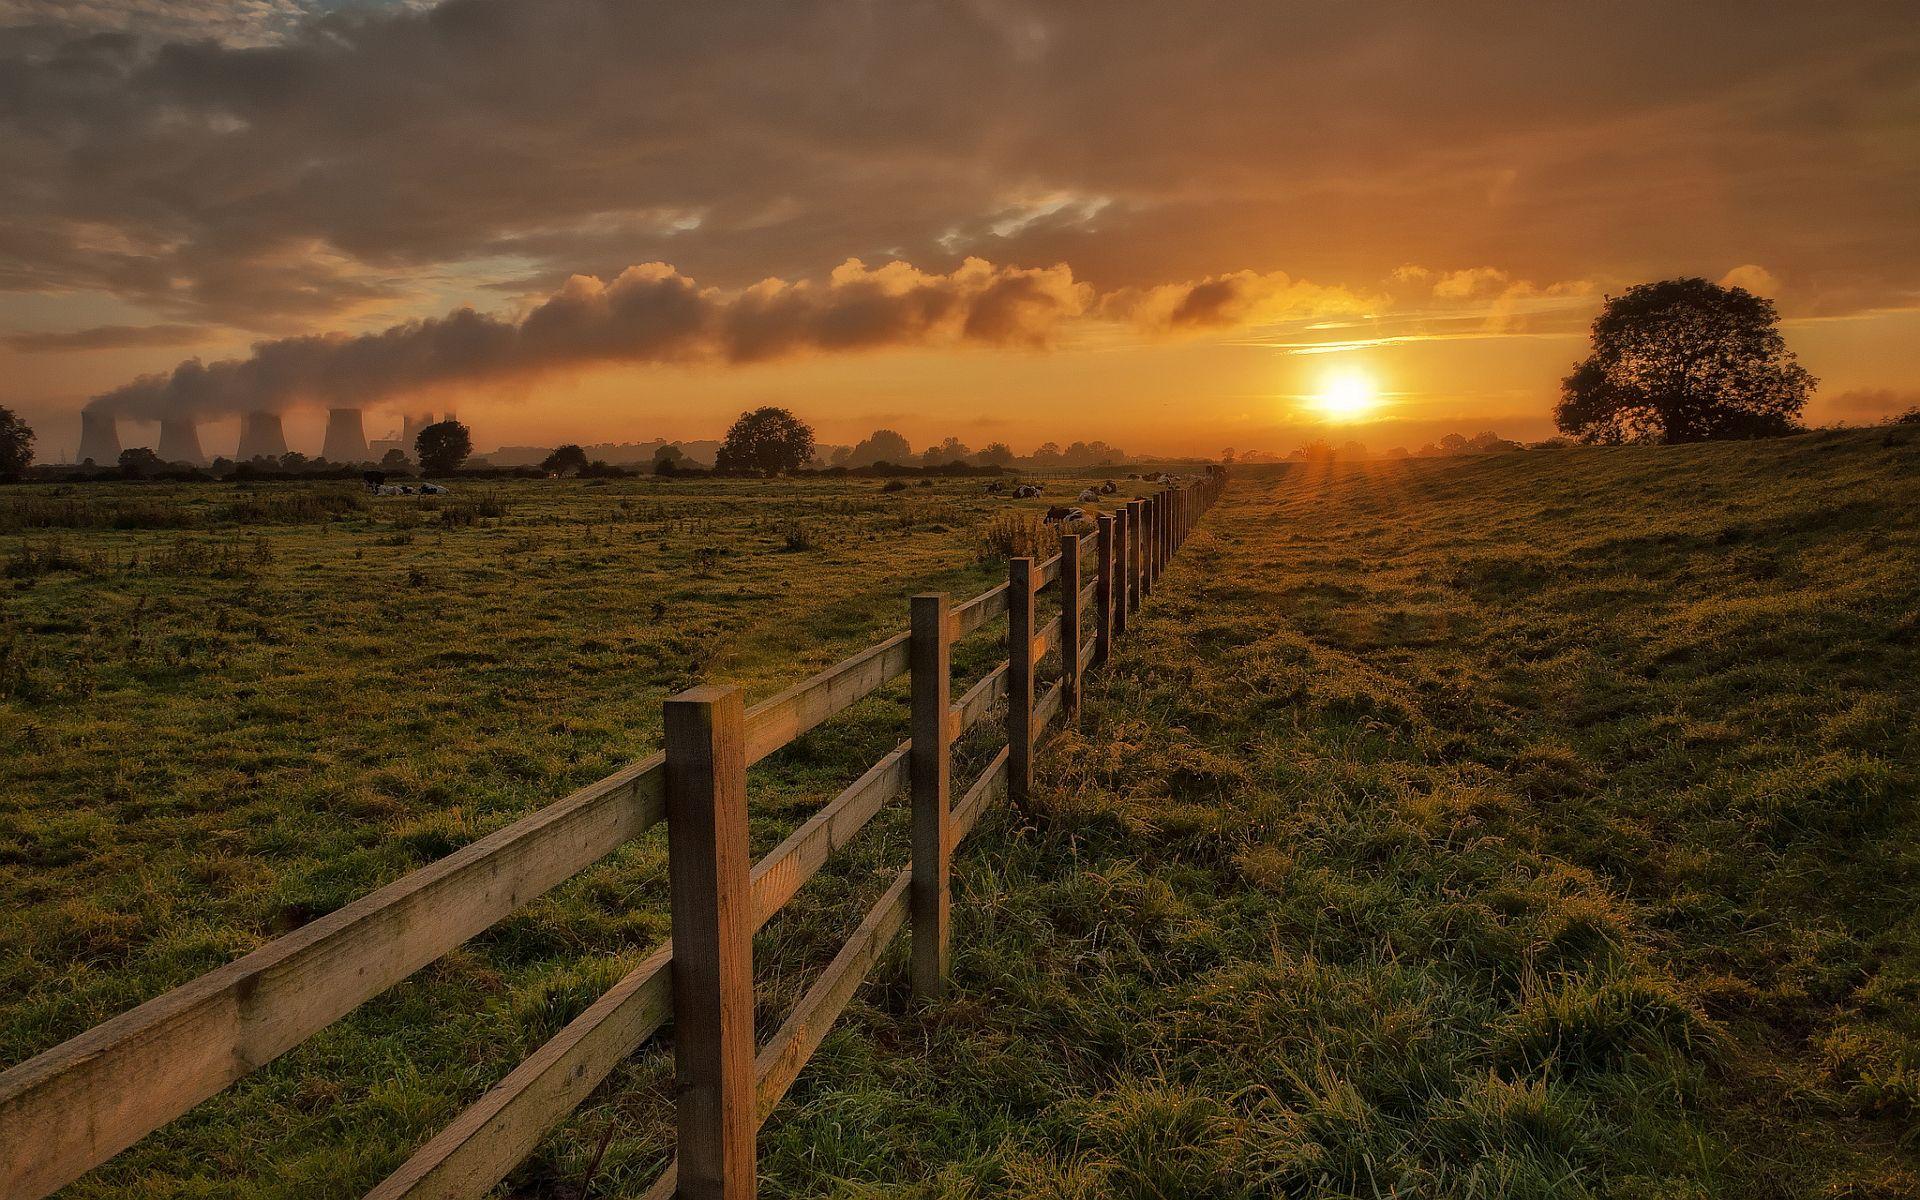 landscape sunset HD Wallpapers Download Free landscape